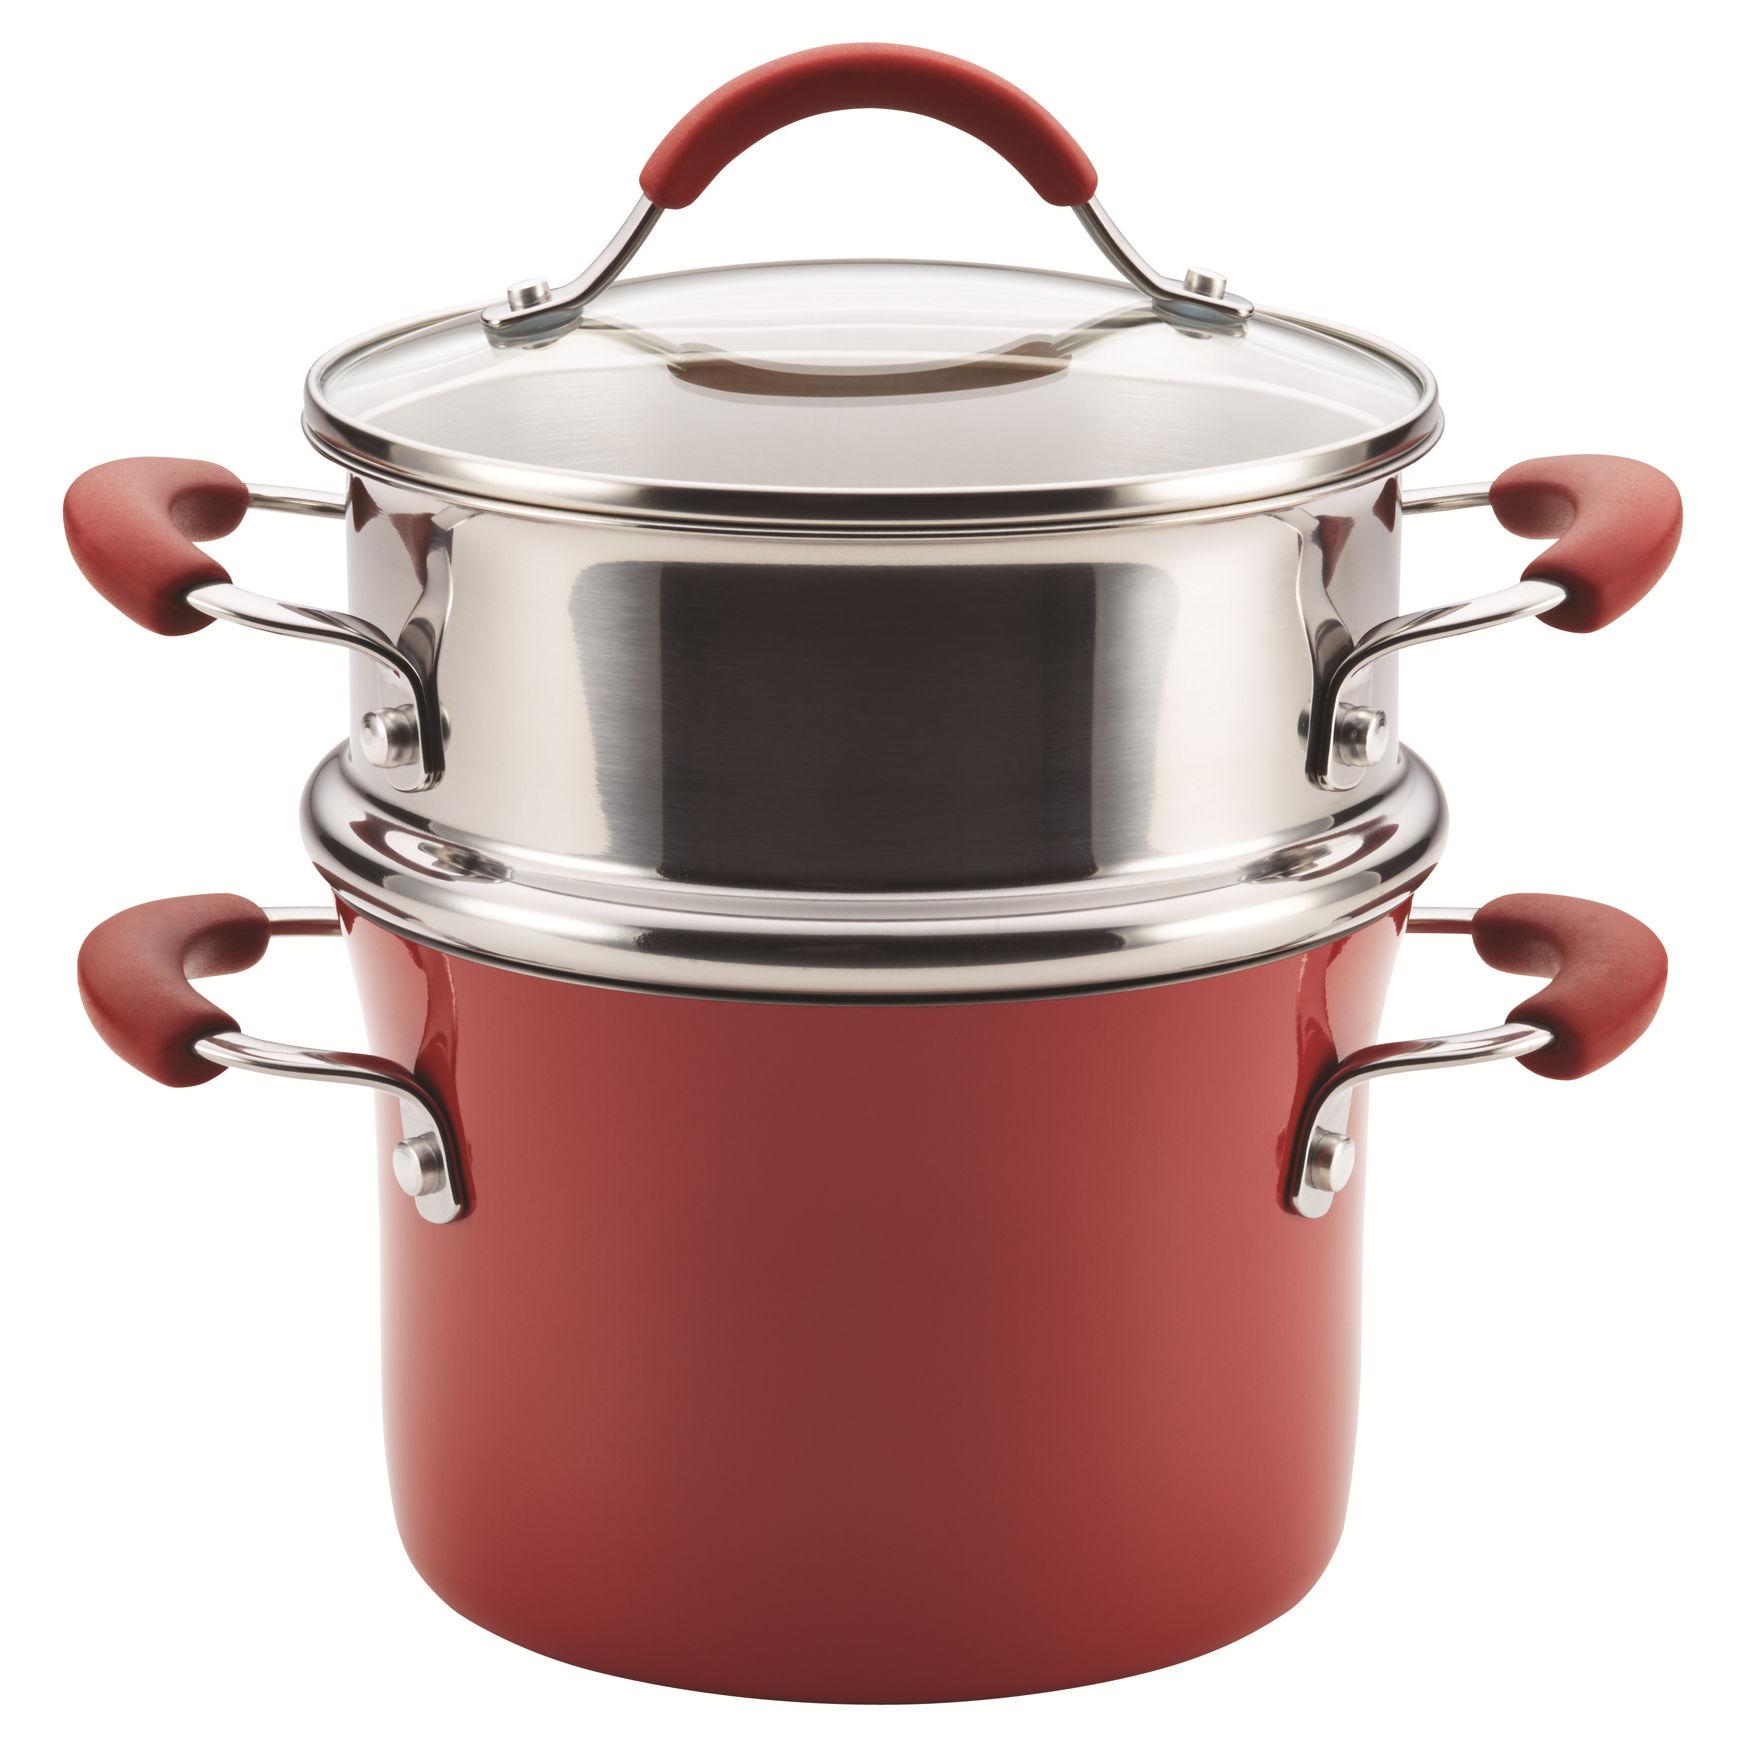 Rachael Ray Cranberry Pots & Dutch Ovens Cookware